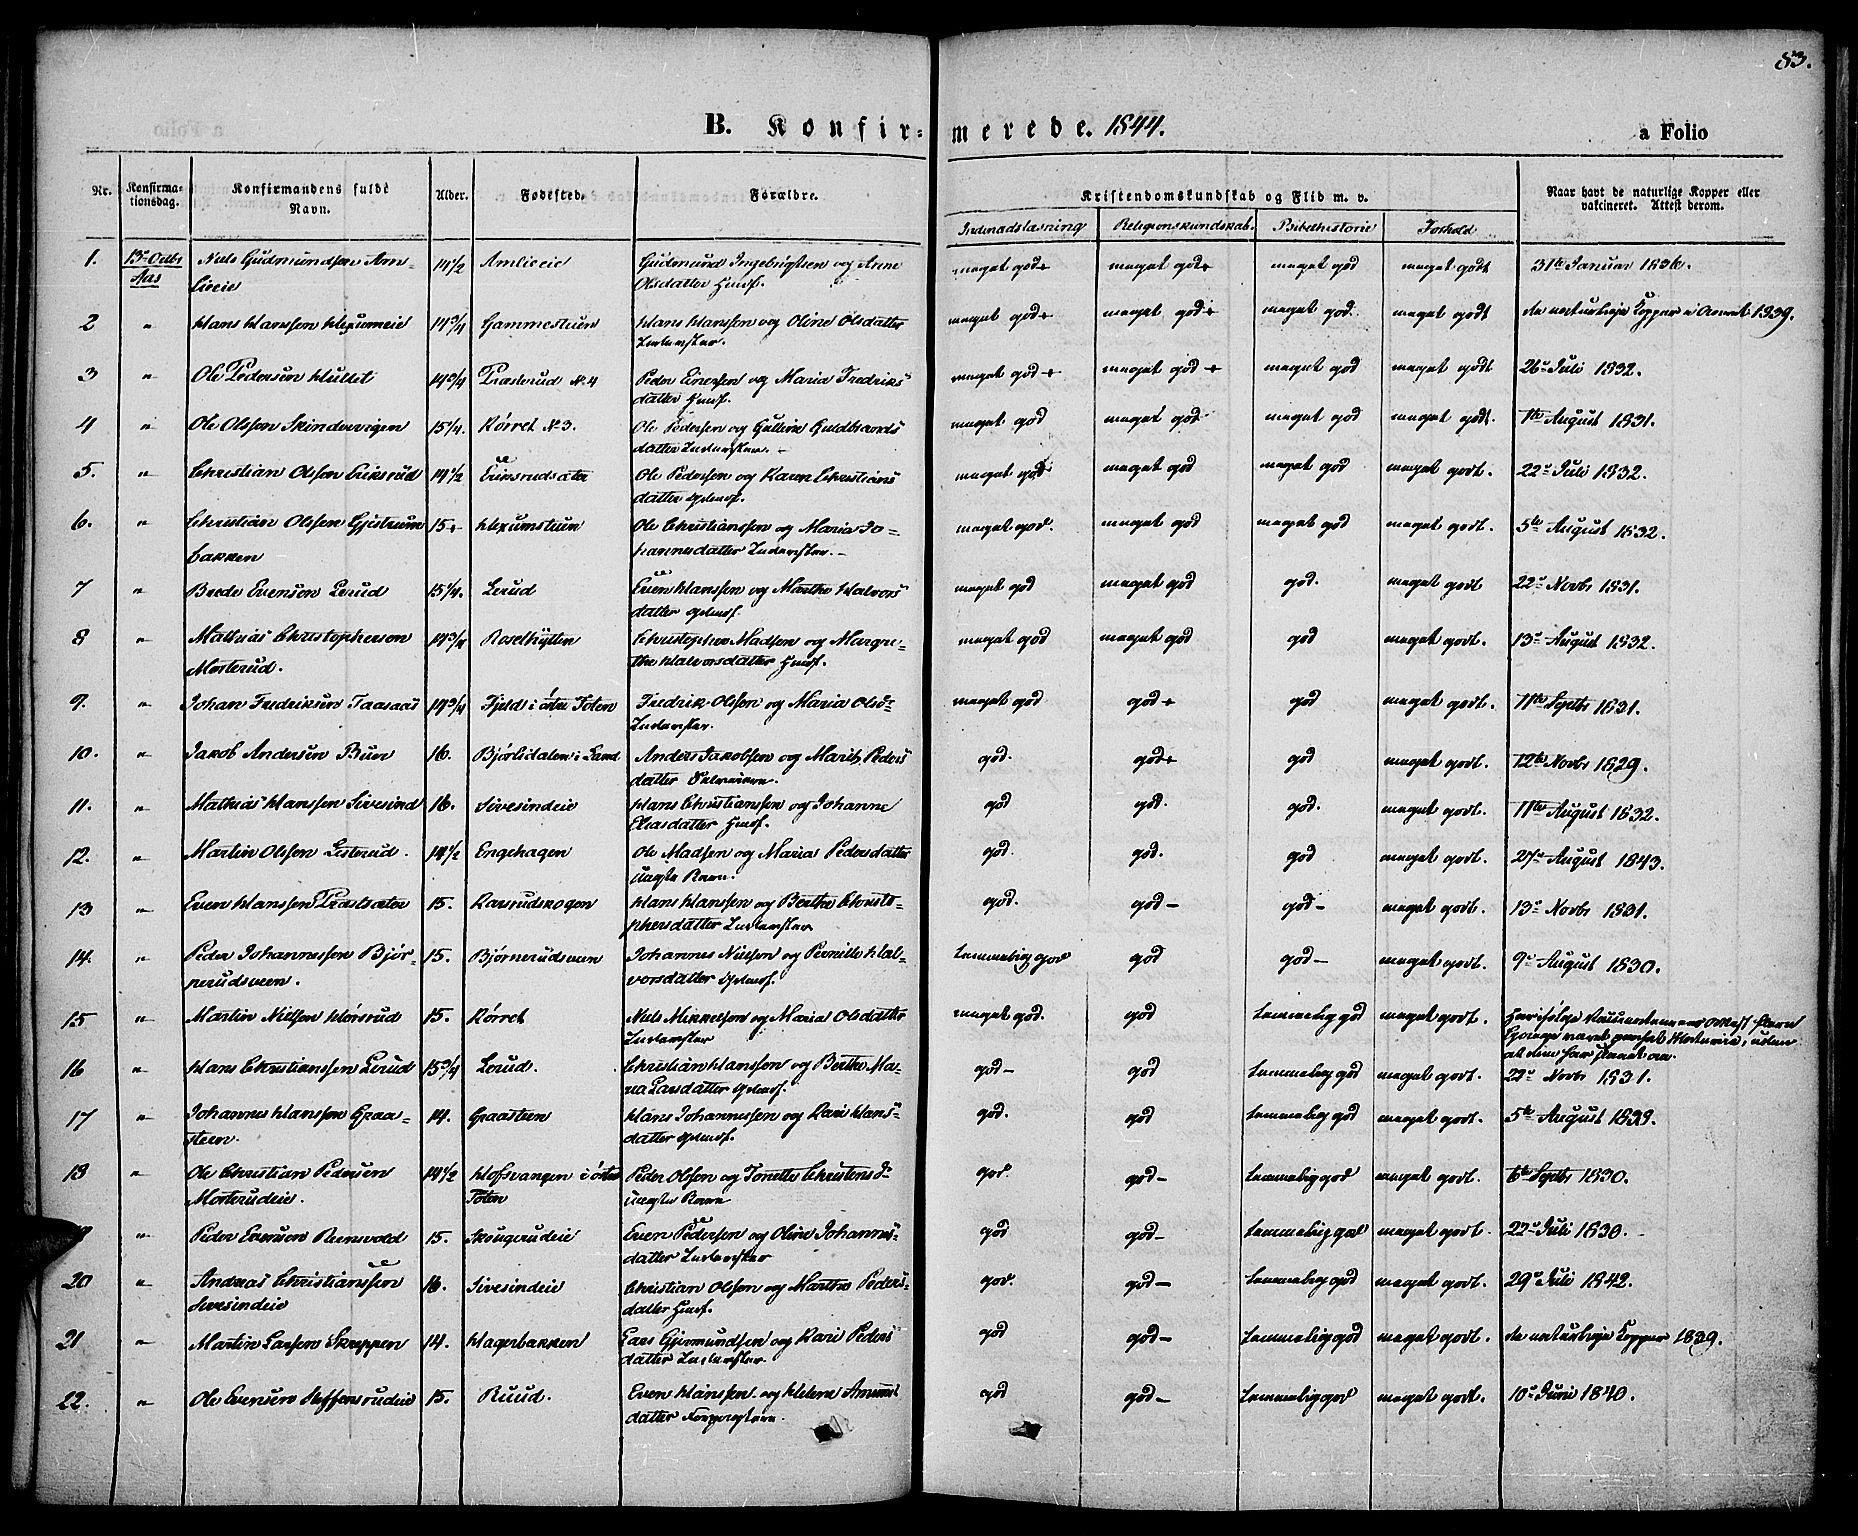 SAH, Vestre Toten prestekontor, H/Ha/Haa/L0004: Ministerialbok nr. 4, 1844-1849, s. 83